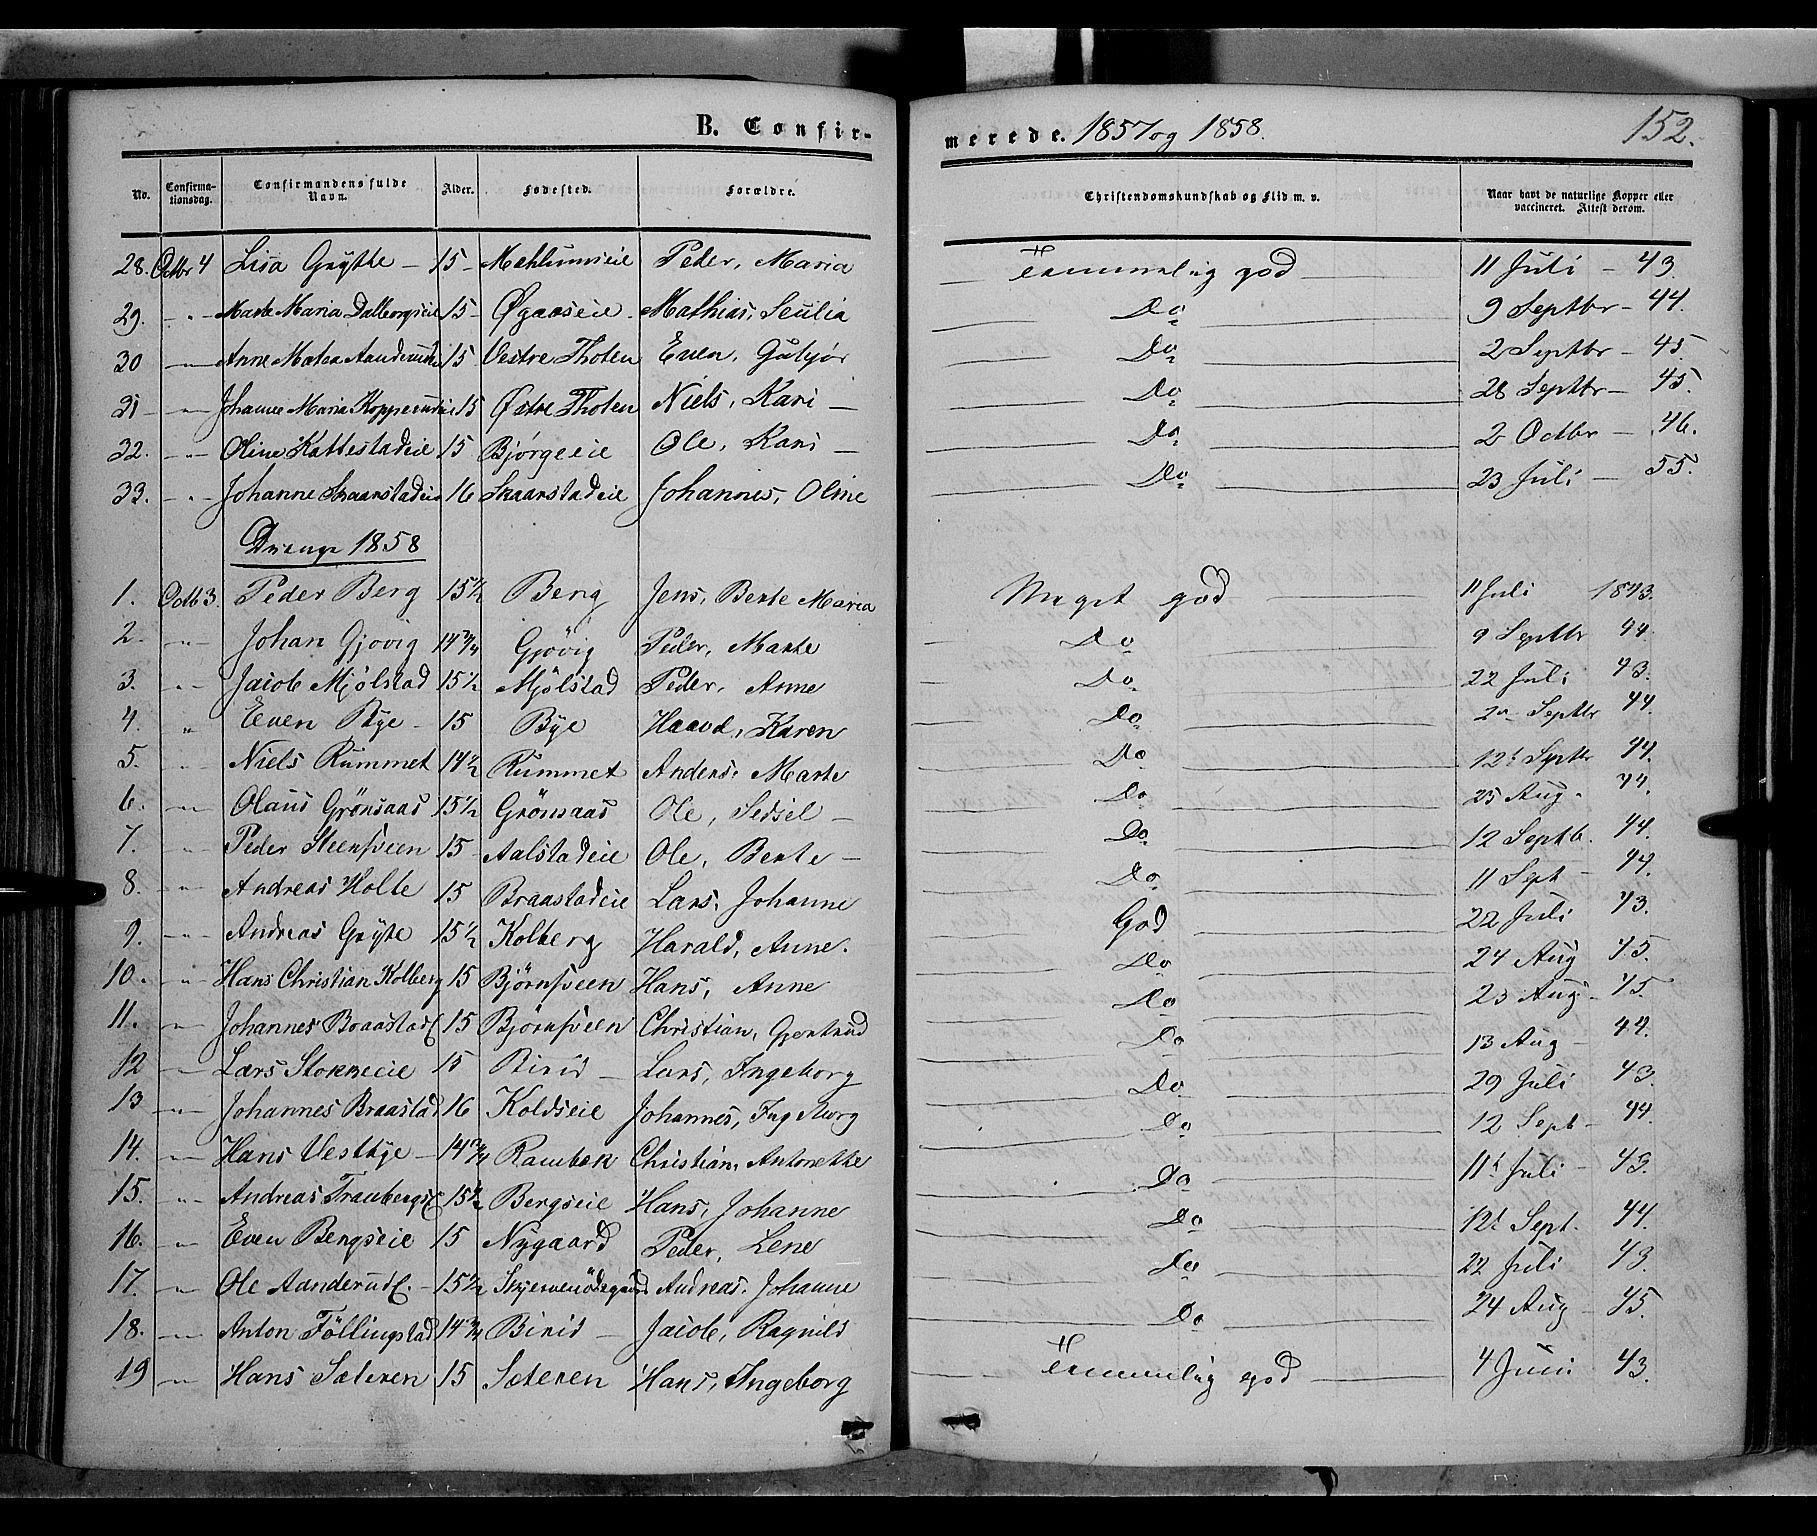 SAH, Vardal prestekontor, H/Ha/Haa/L0006: Ministerialbok nr. 6, 1854-1866, s. 152